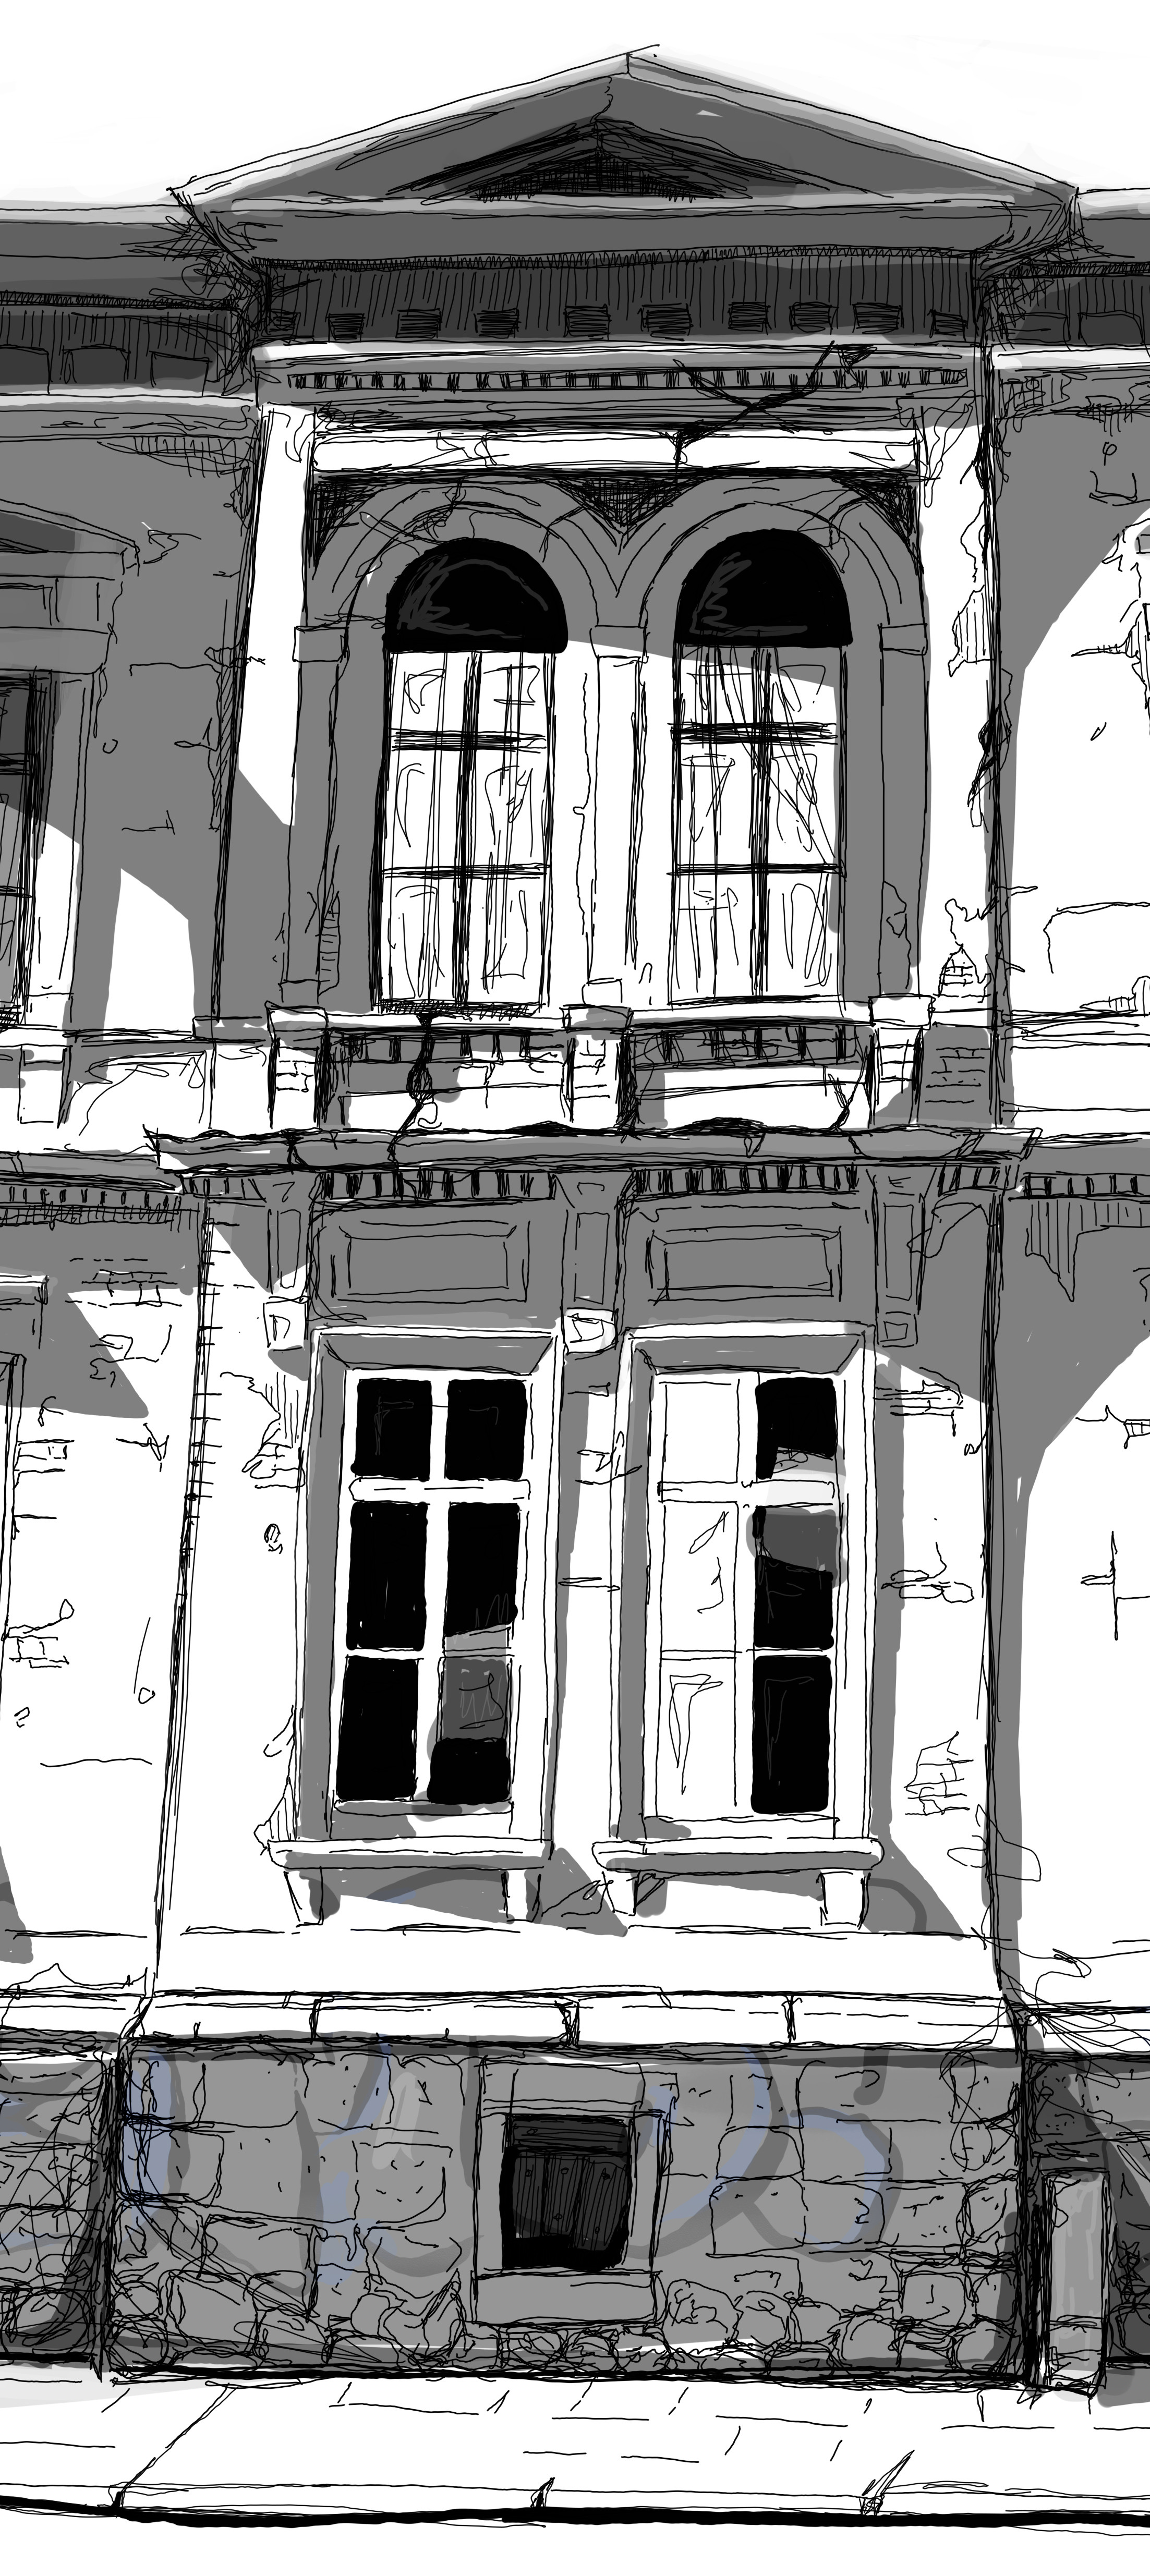 final texture drawing, close up